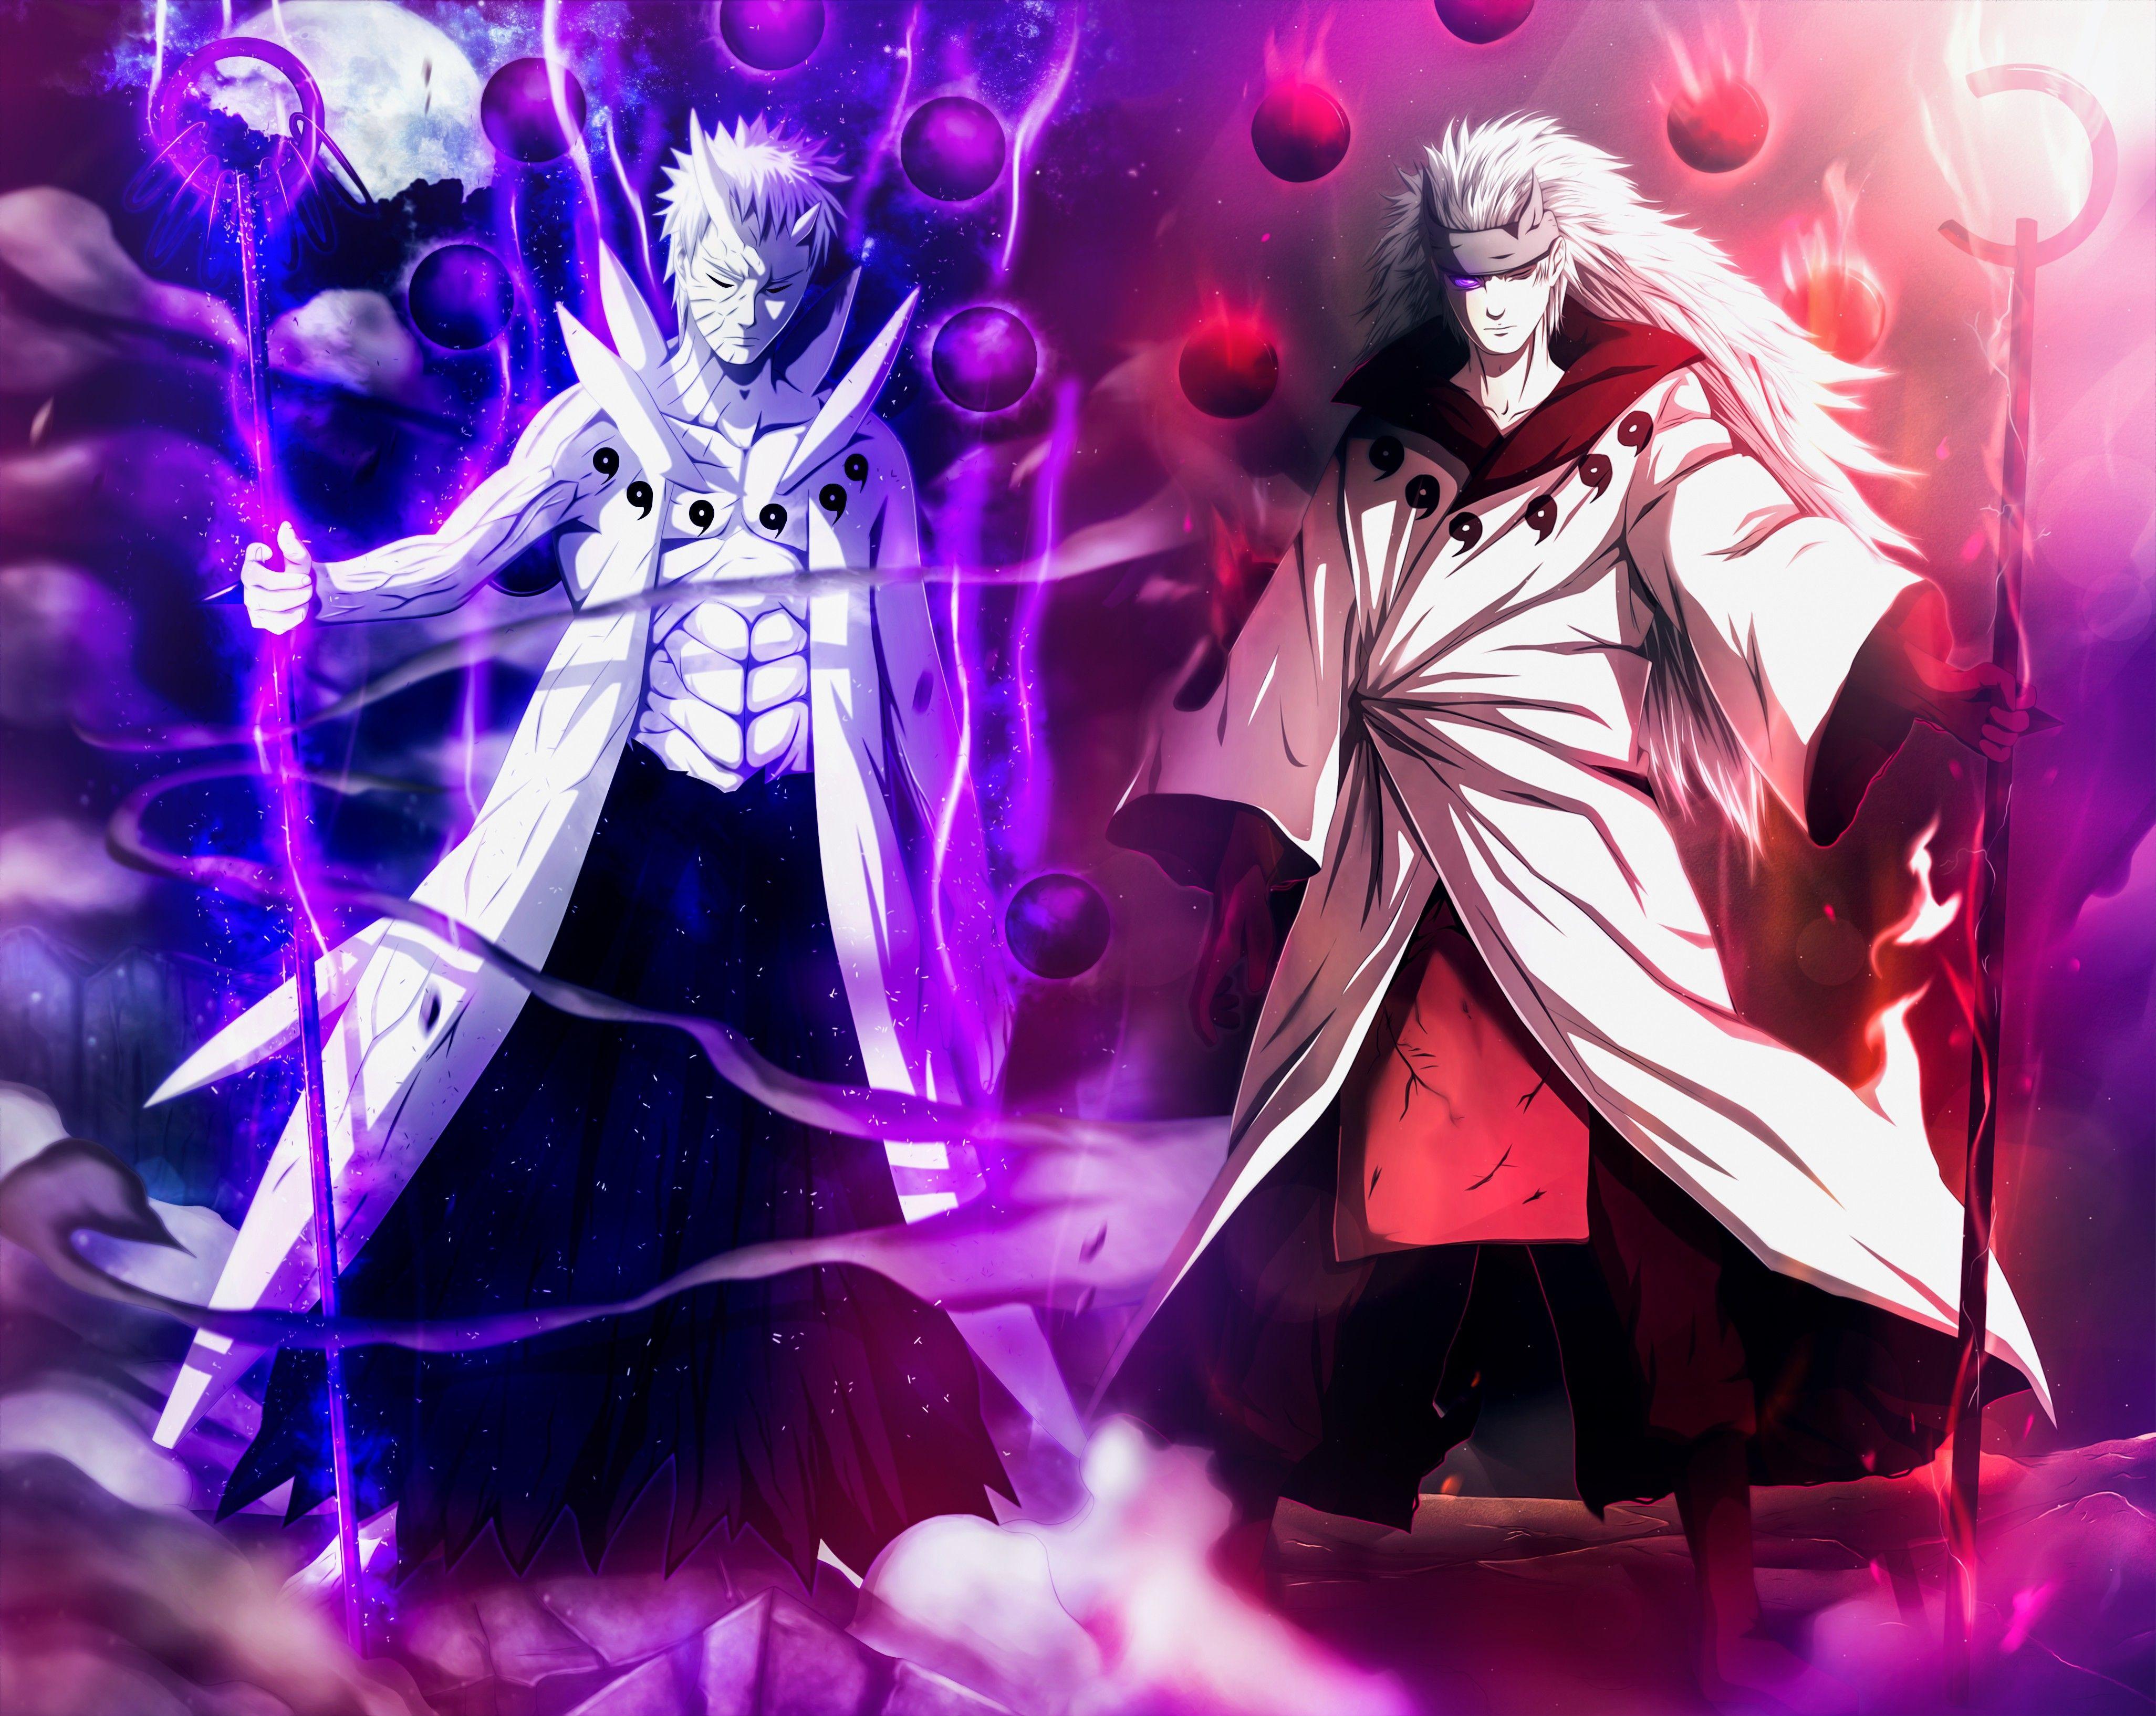 Anime Naruto Madara Uchiha Obito Uchiha Sage Of Six Paths